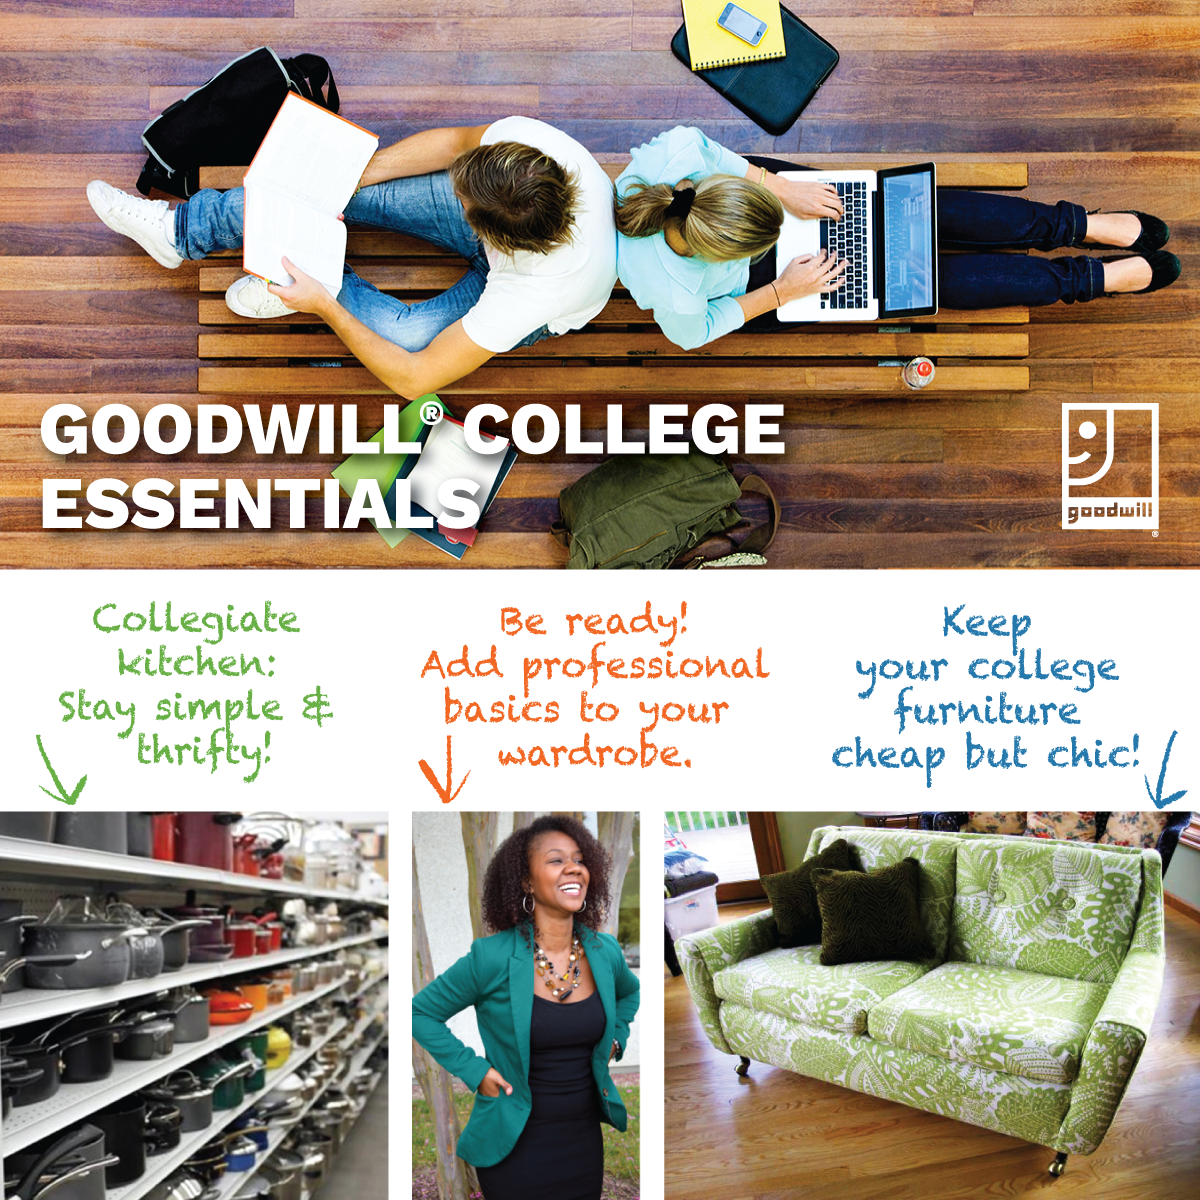 Goodwill College Essentials